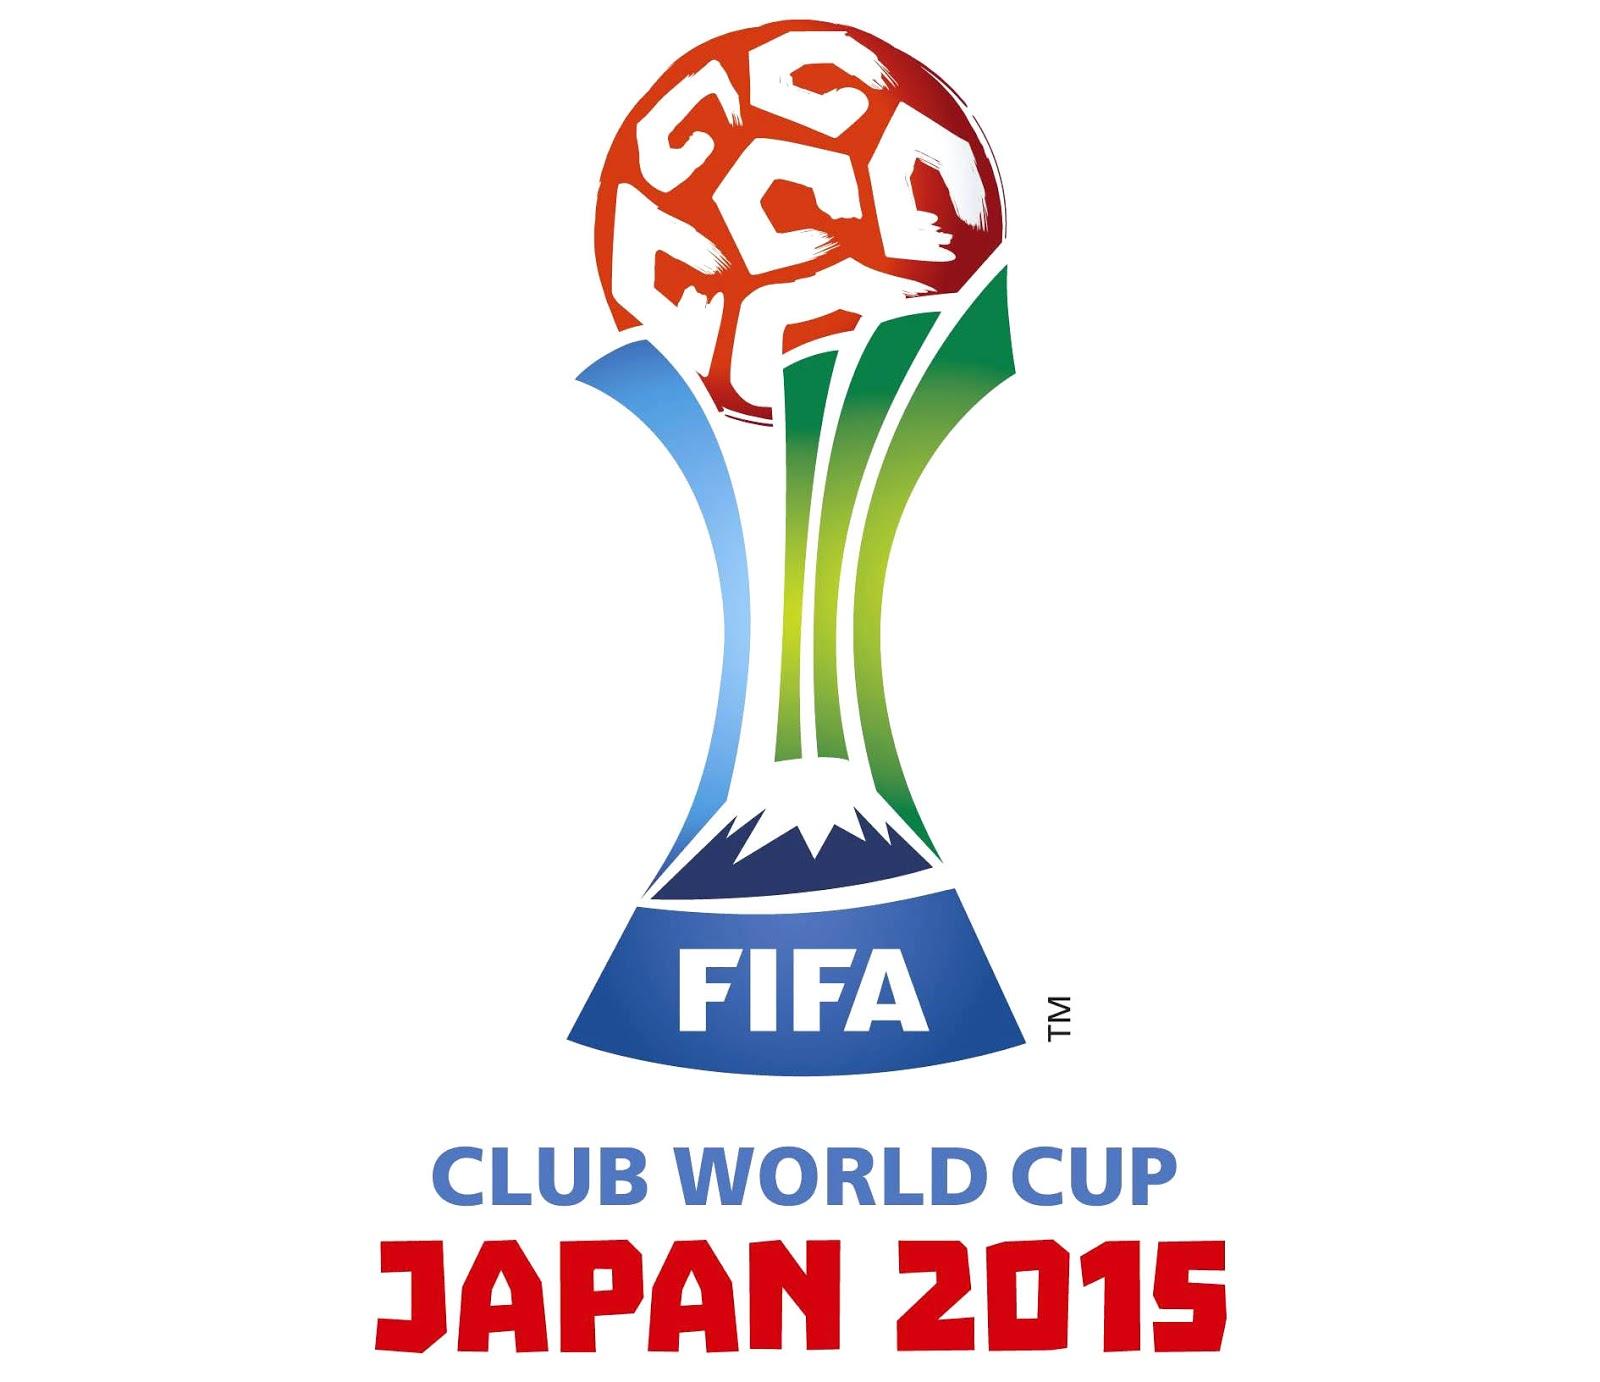 FIFAクラブW杯2015 ロゴ